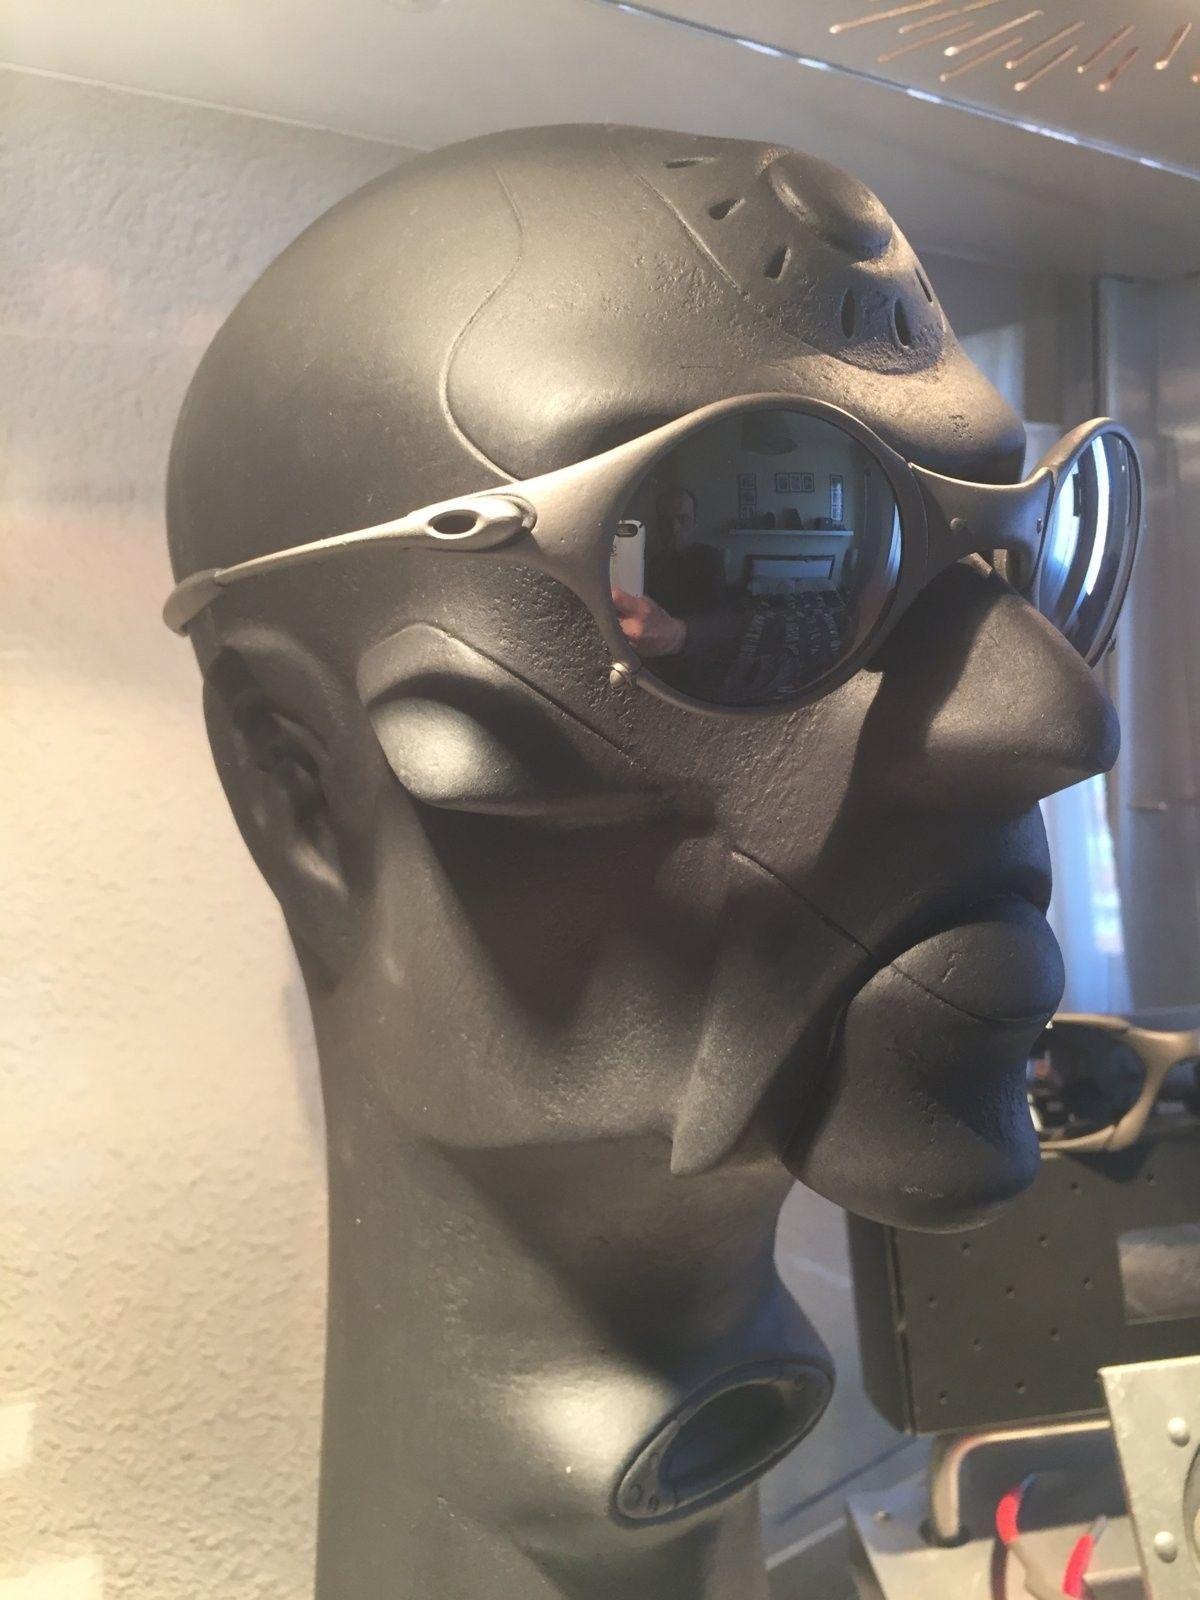 Bnob-wd Mars Xmetal w/ Black Iridium lenses #SOLD - image.jpeg